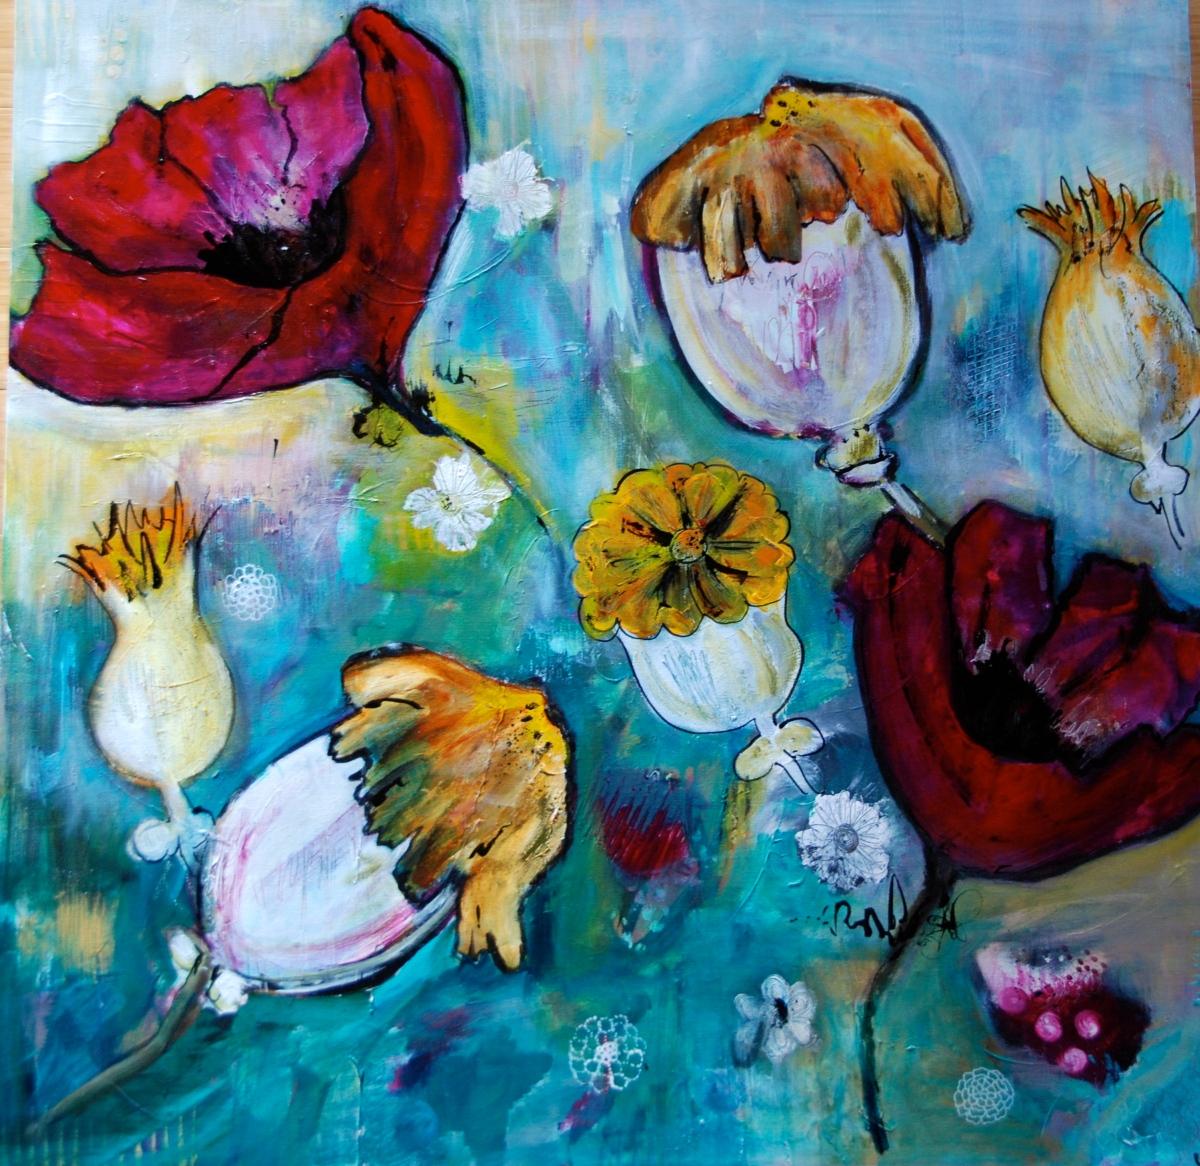 acrylic paint, flora bowley, art,poppies